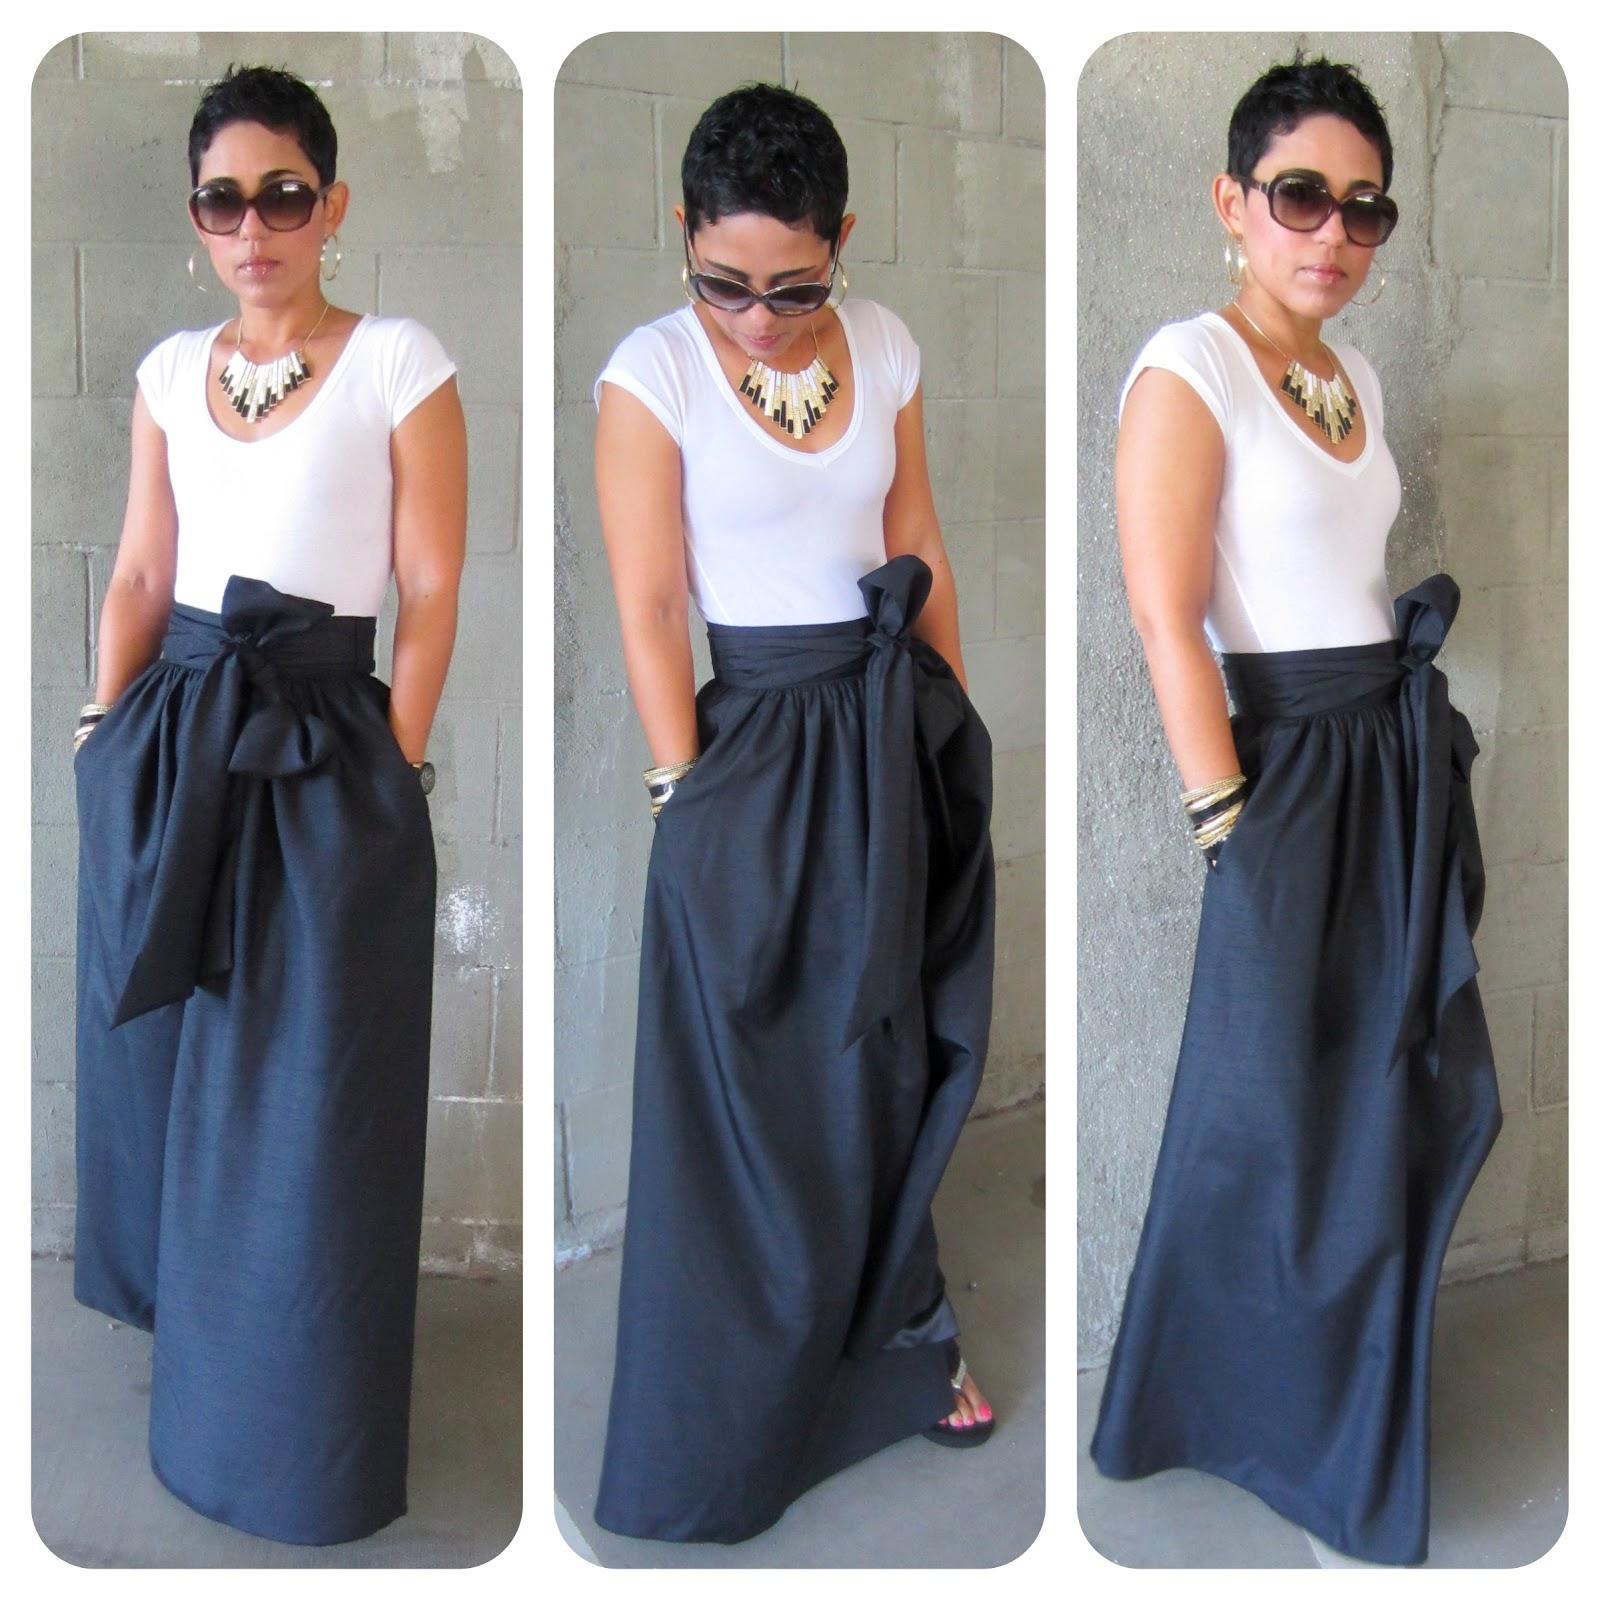 Dressy Long Skirts - Skirts